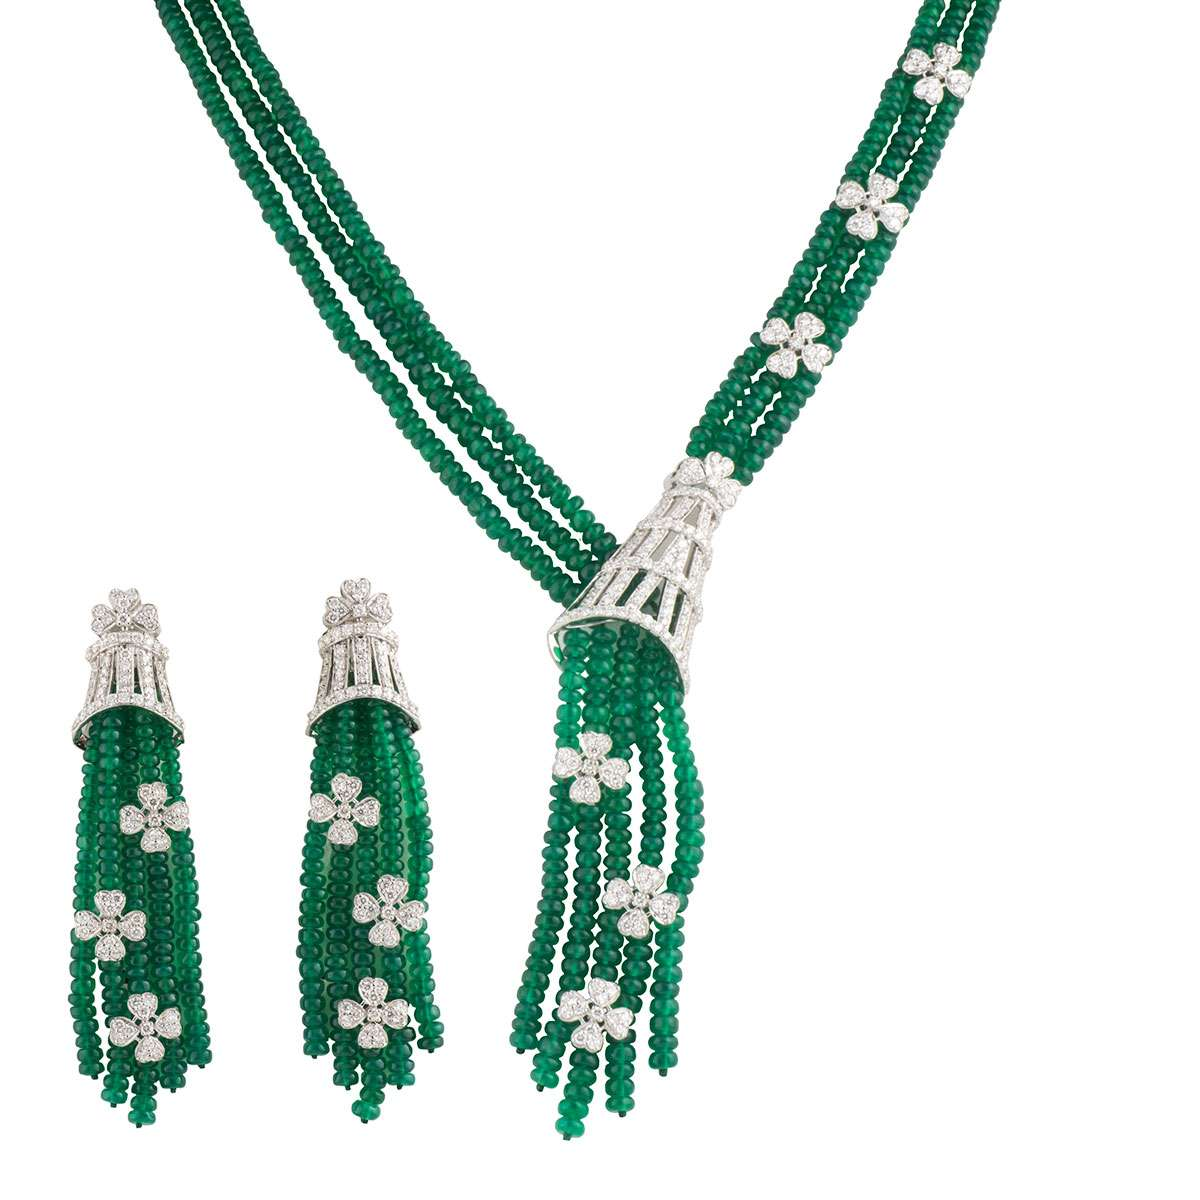 White Gold Emerald and Diamond Jewellery Suite